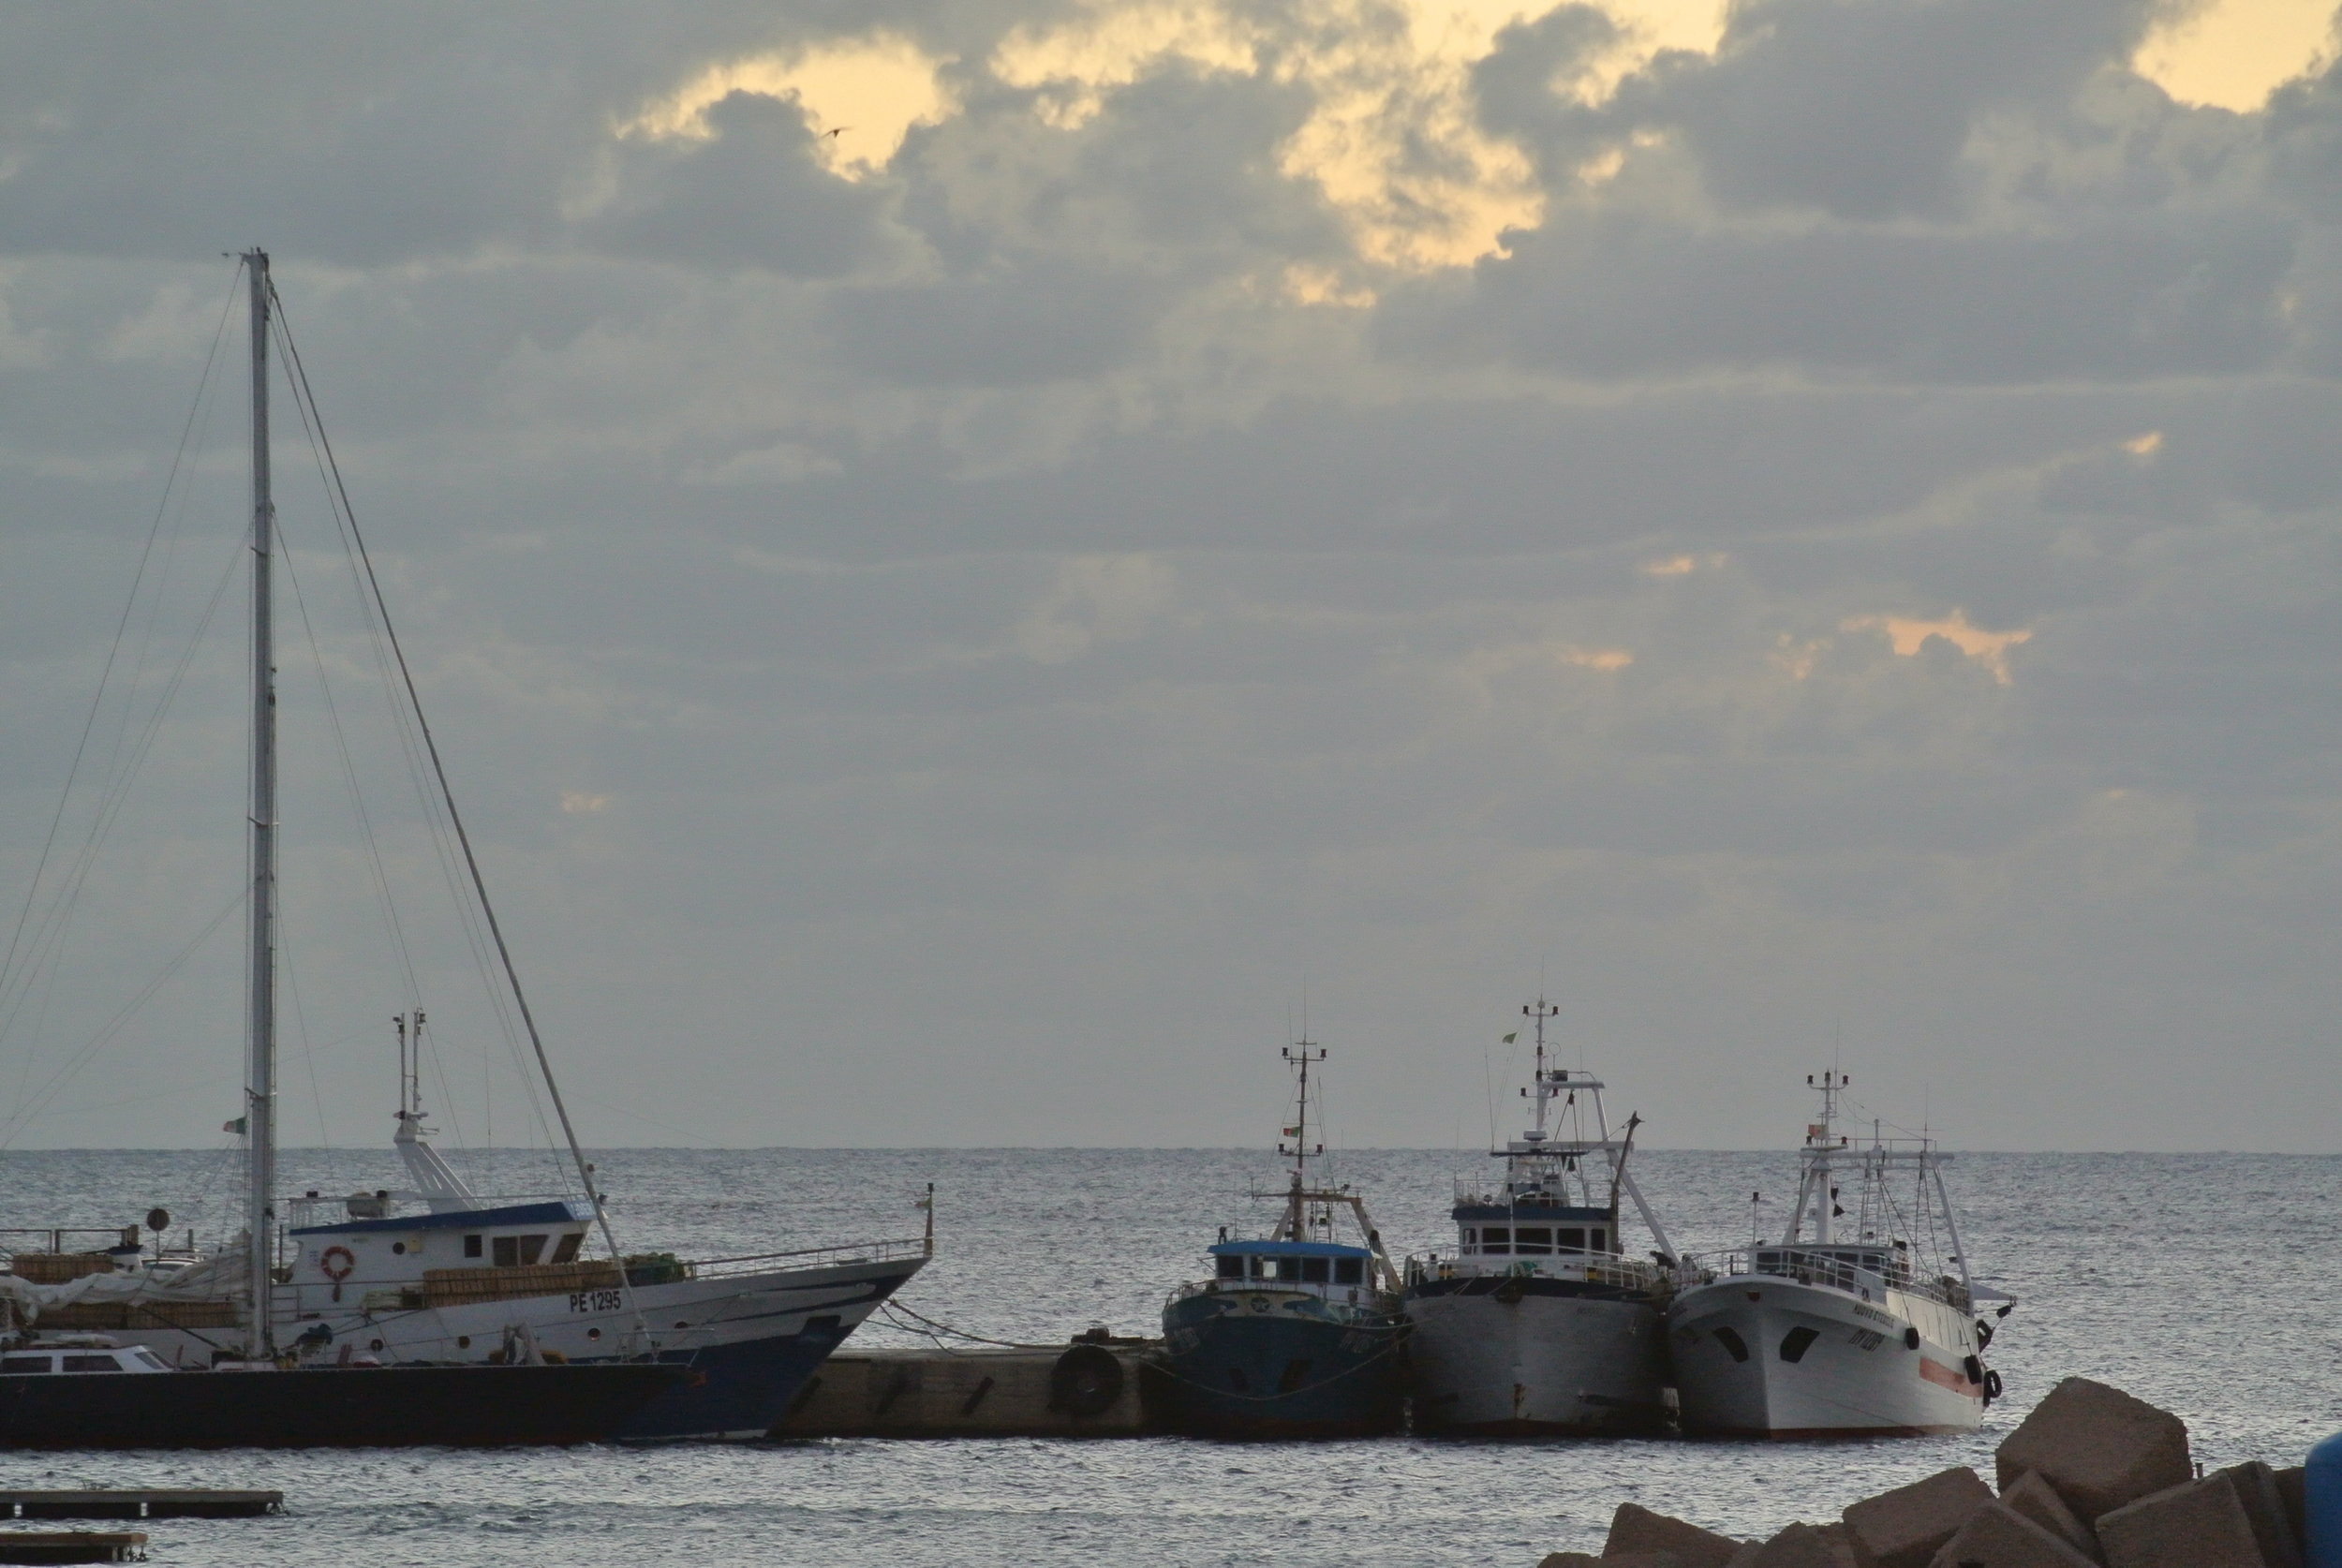 Fishing boats docked for weather. Lampedusa, Italy; October 2017. © Pamela Kerpius